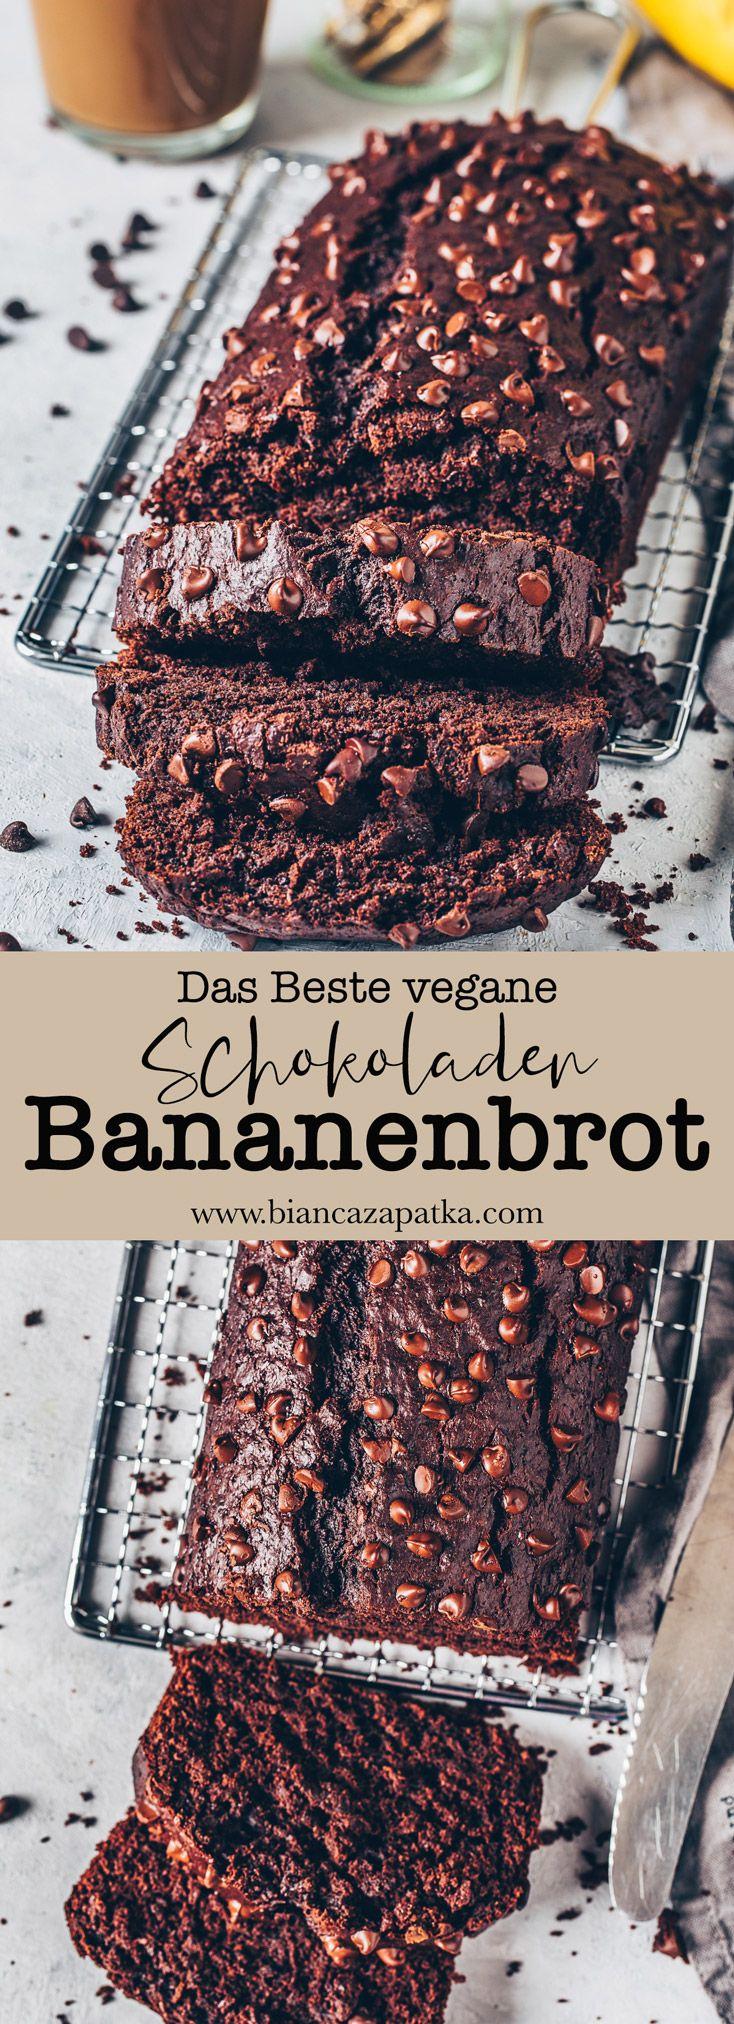 Das beste Vegane Schoko-Bananenbrot - Bianca Zapatka | Rezepte